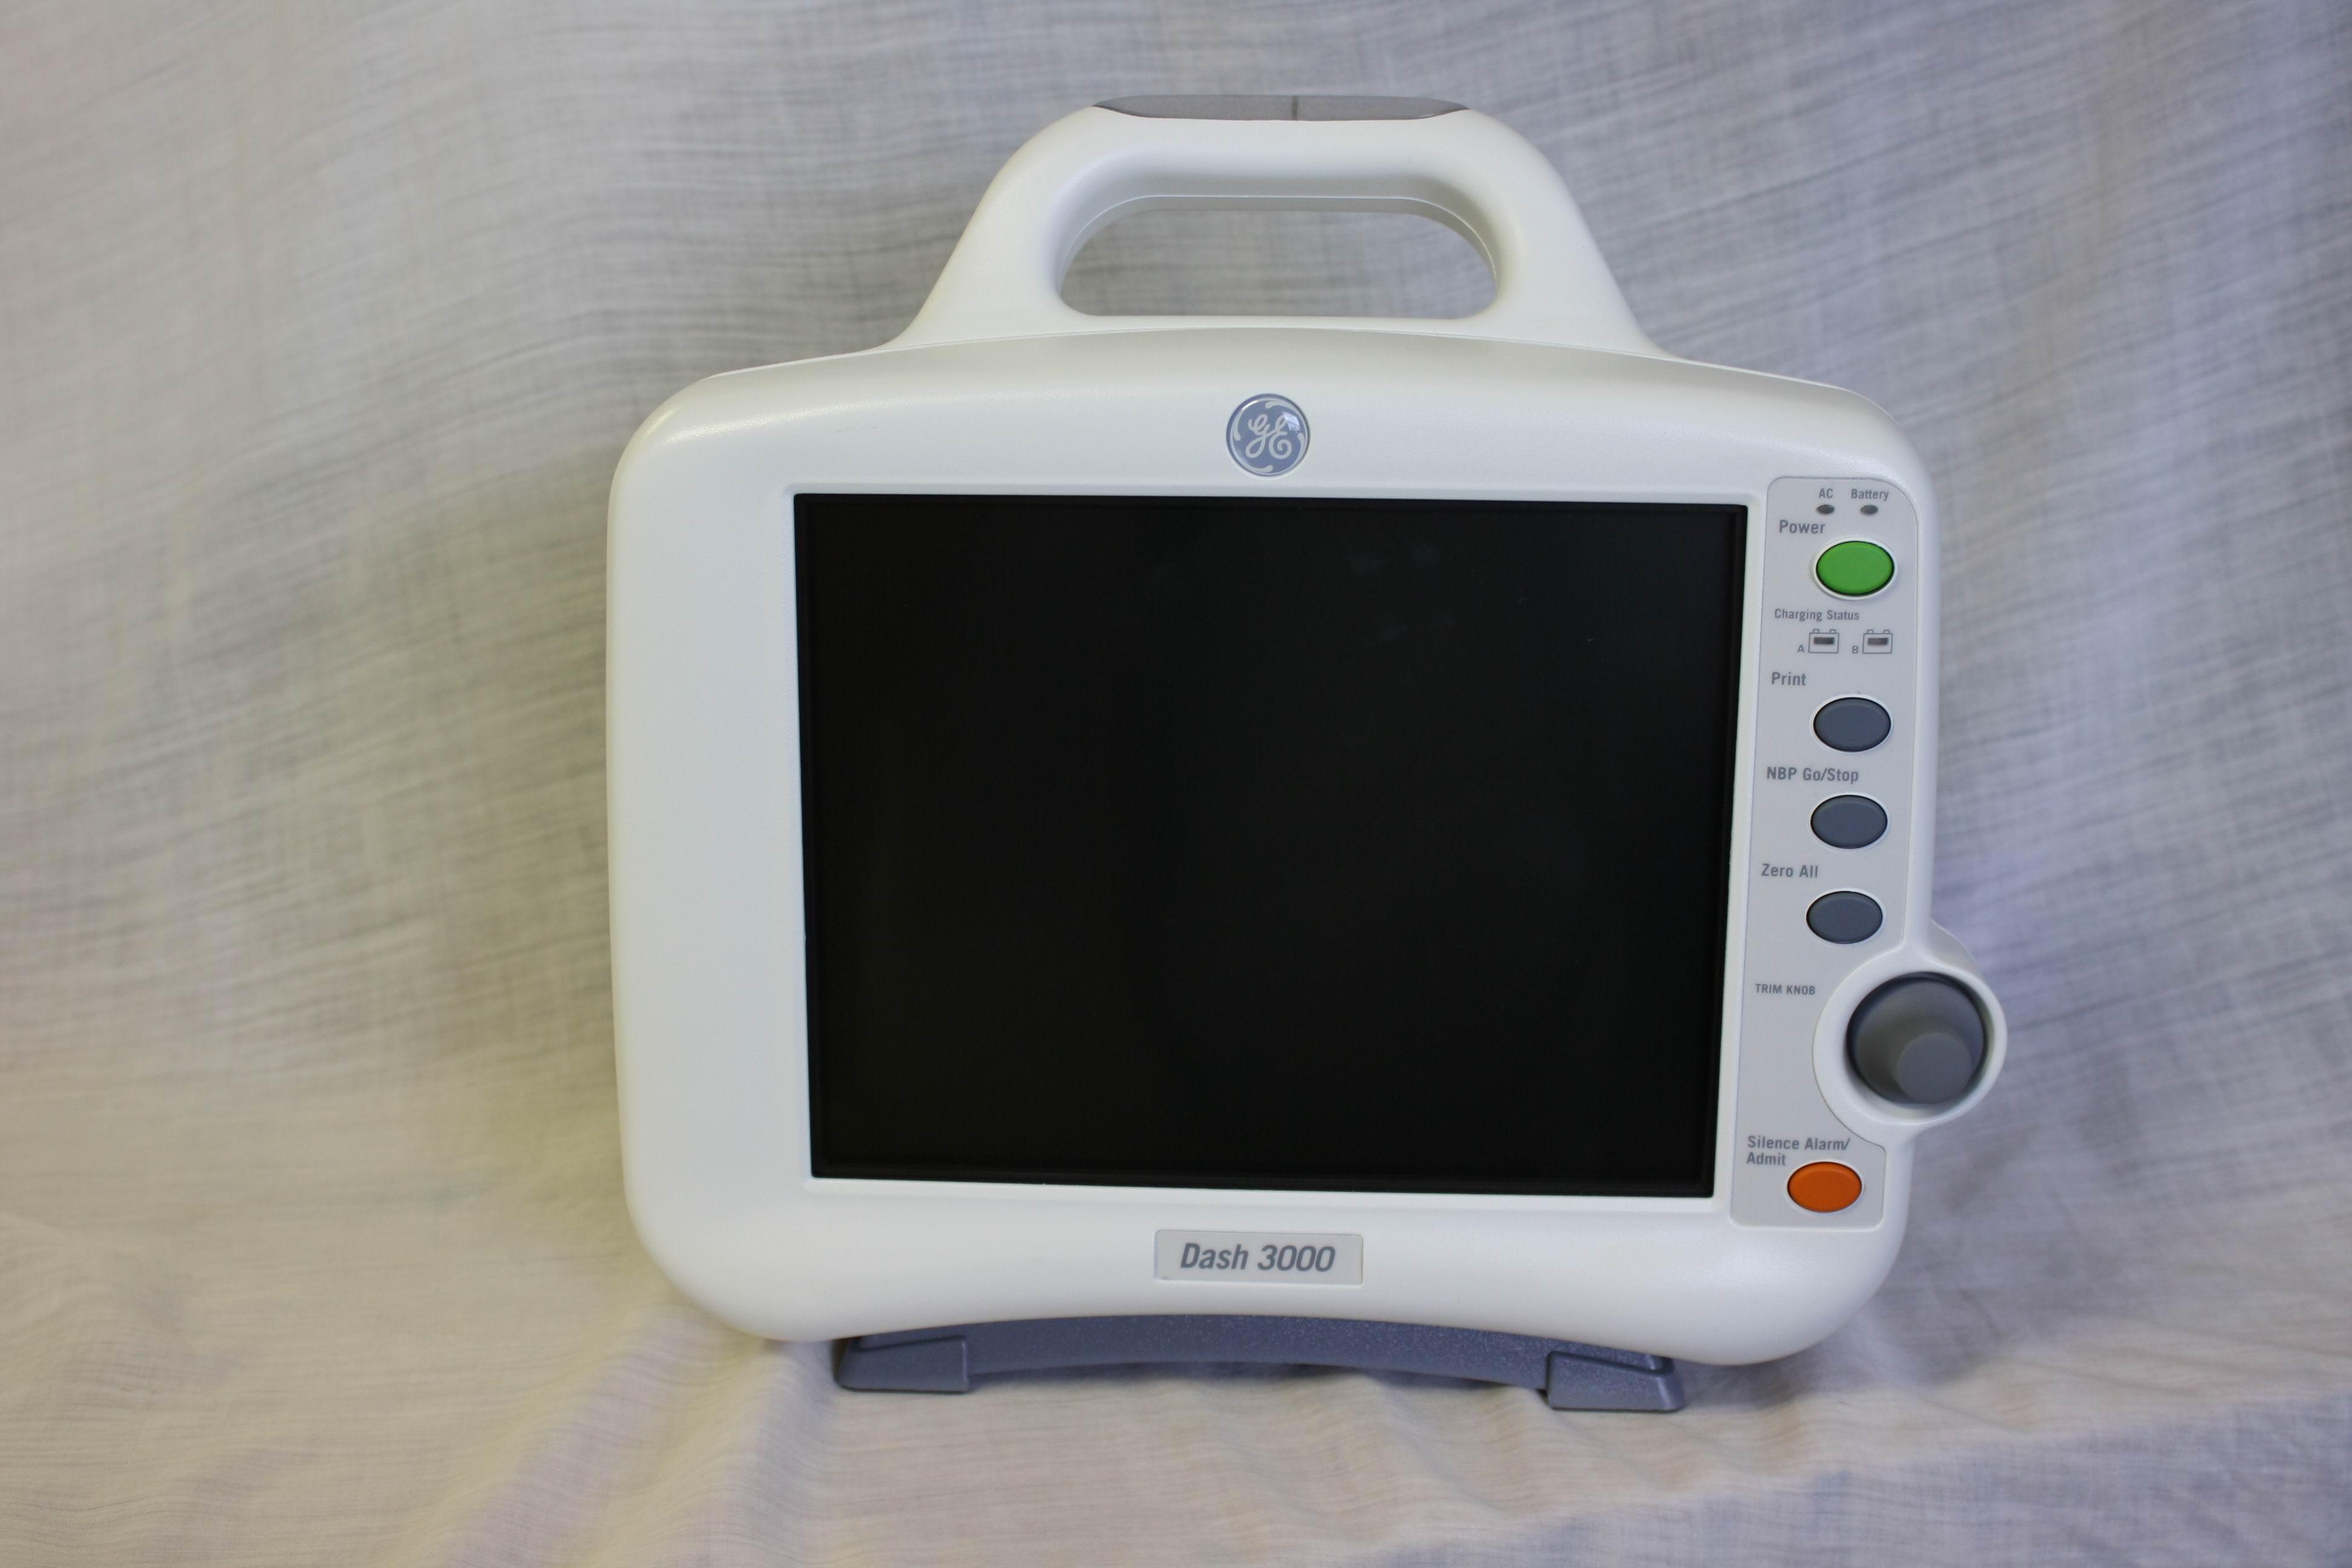 Dash Monitor